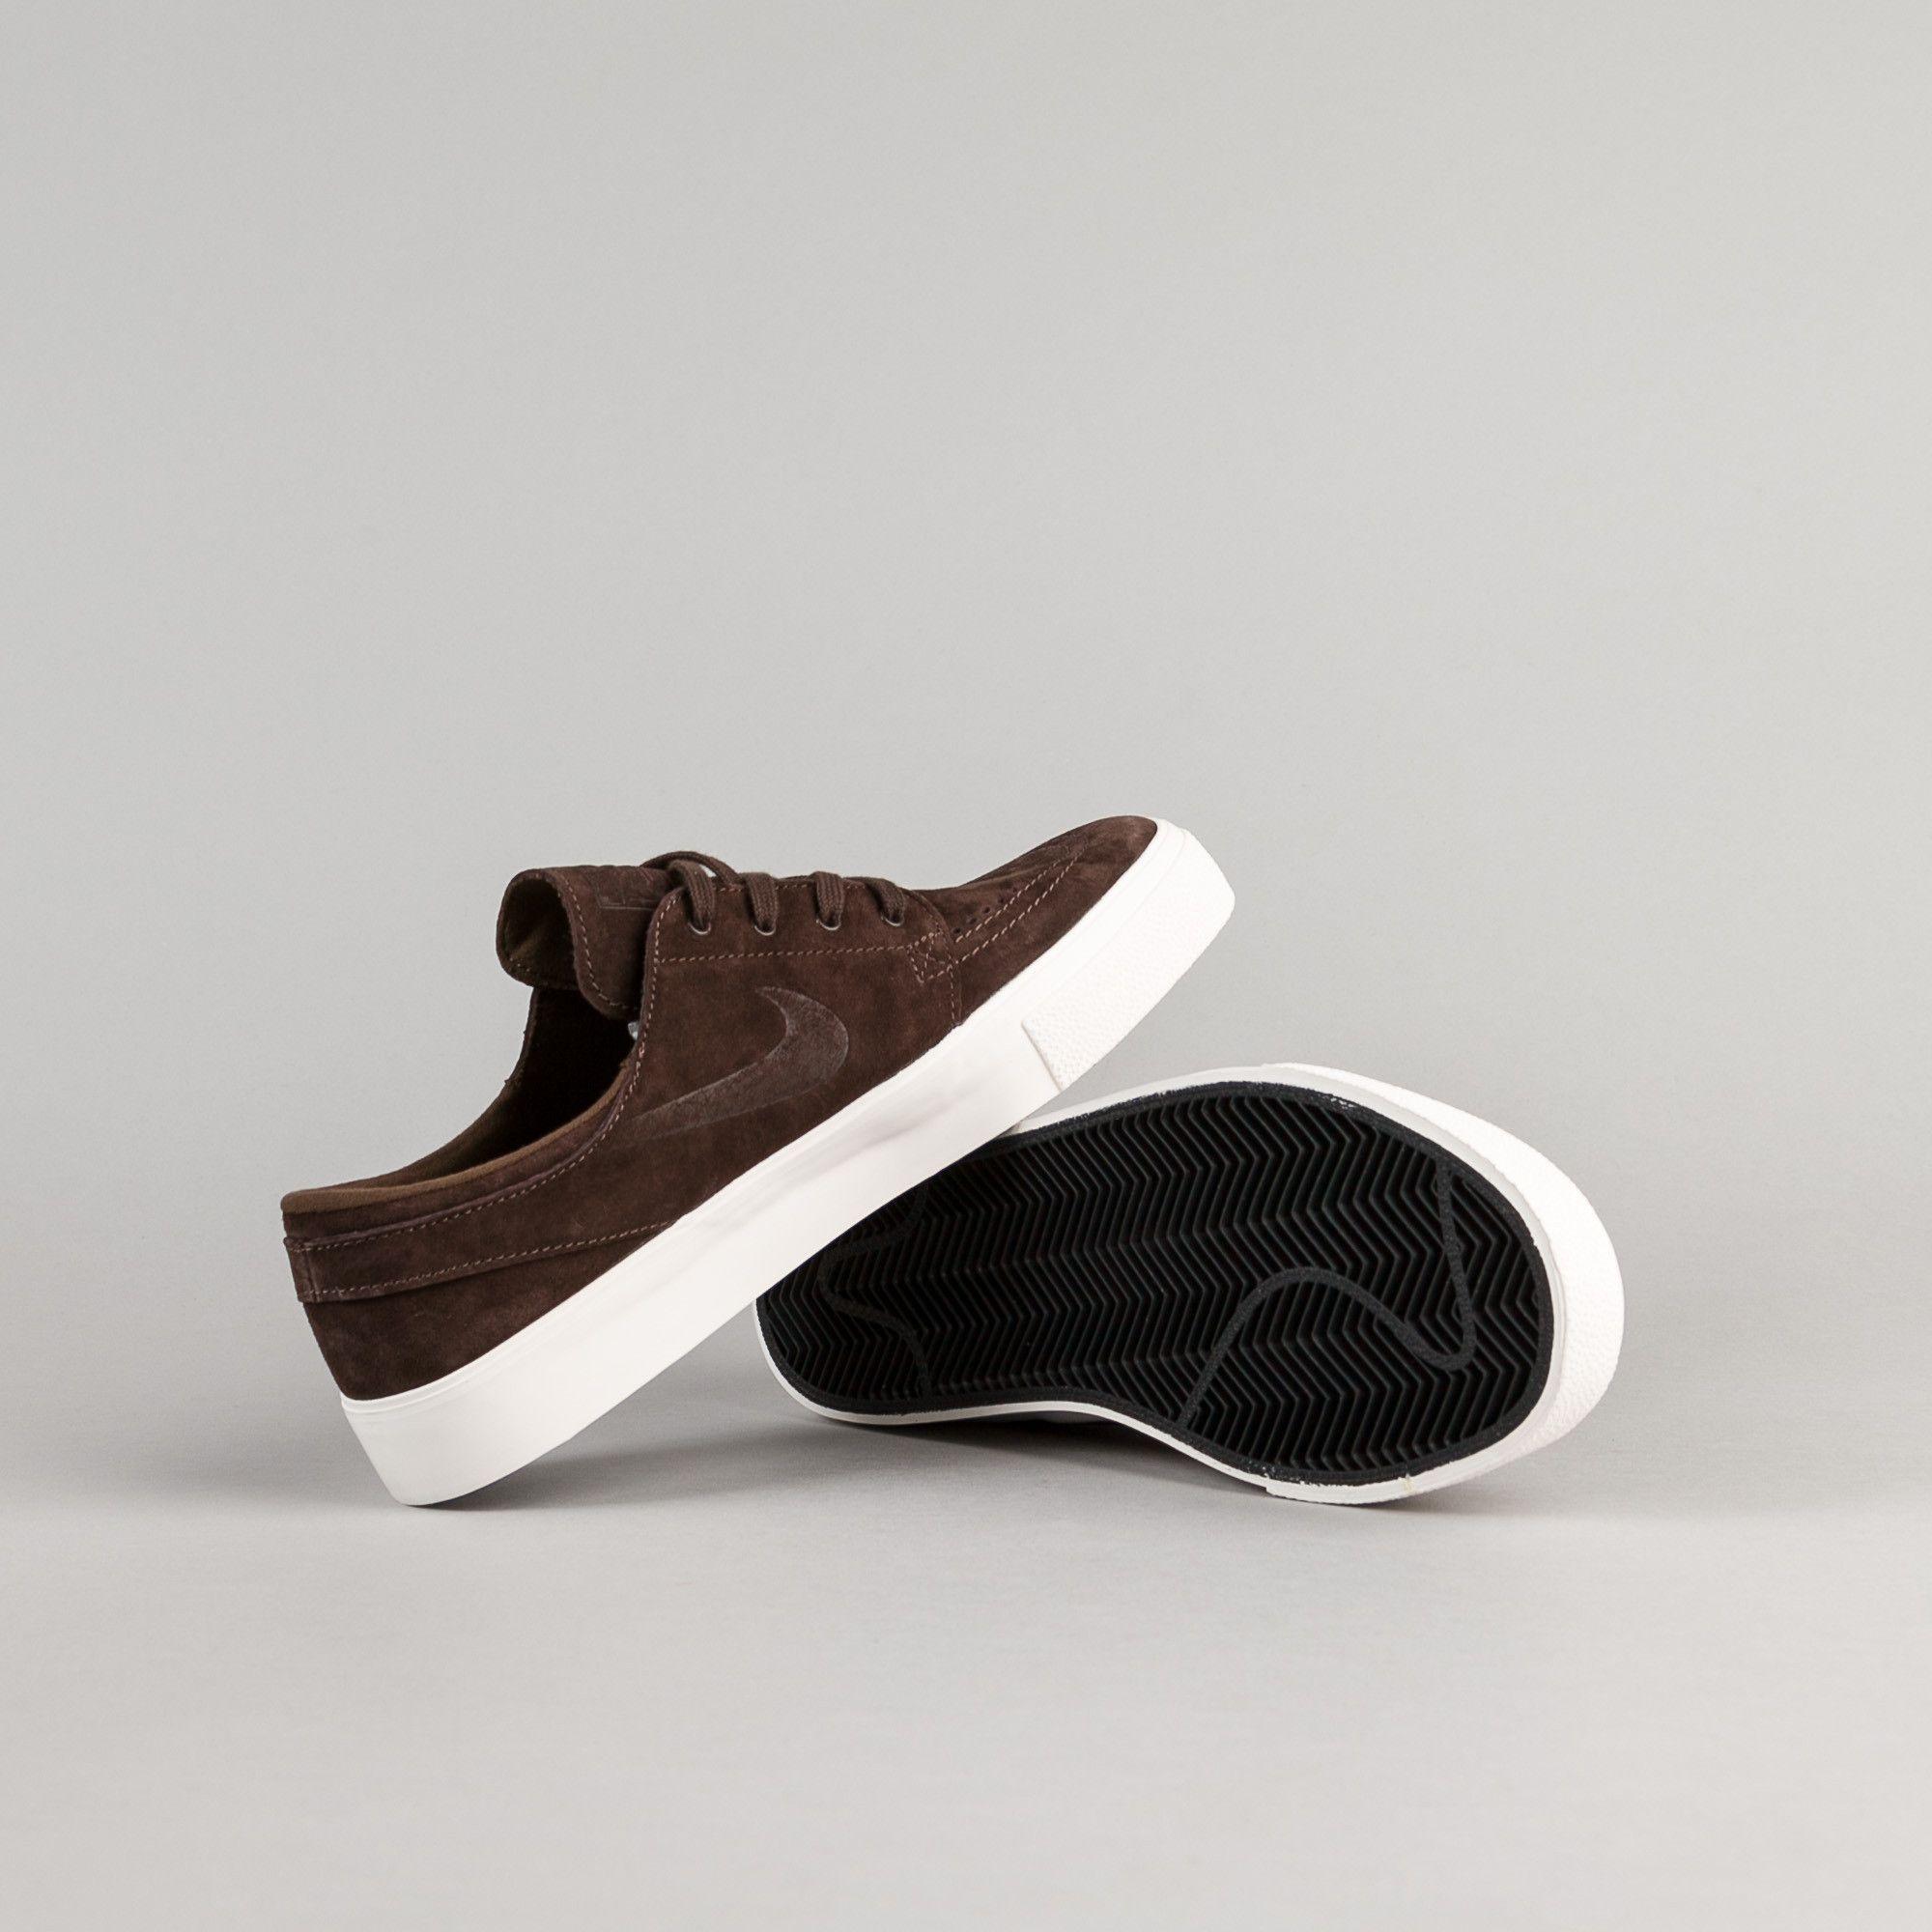 buy popular 81fed c7b49 Nike SB Stefan Janoski Premium HT Shoes - Baroque Brown   Baroque Brown -  Ivory